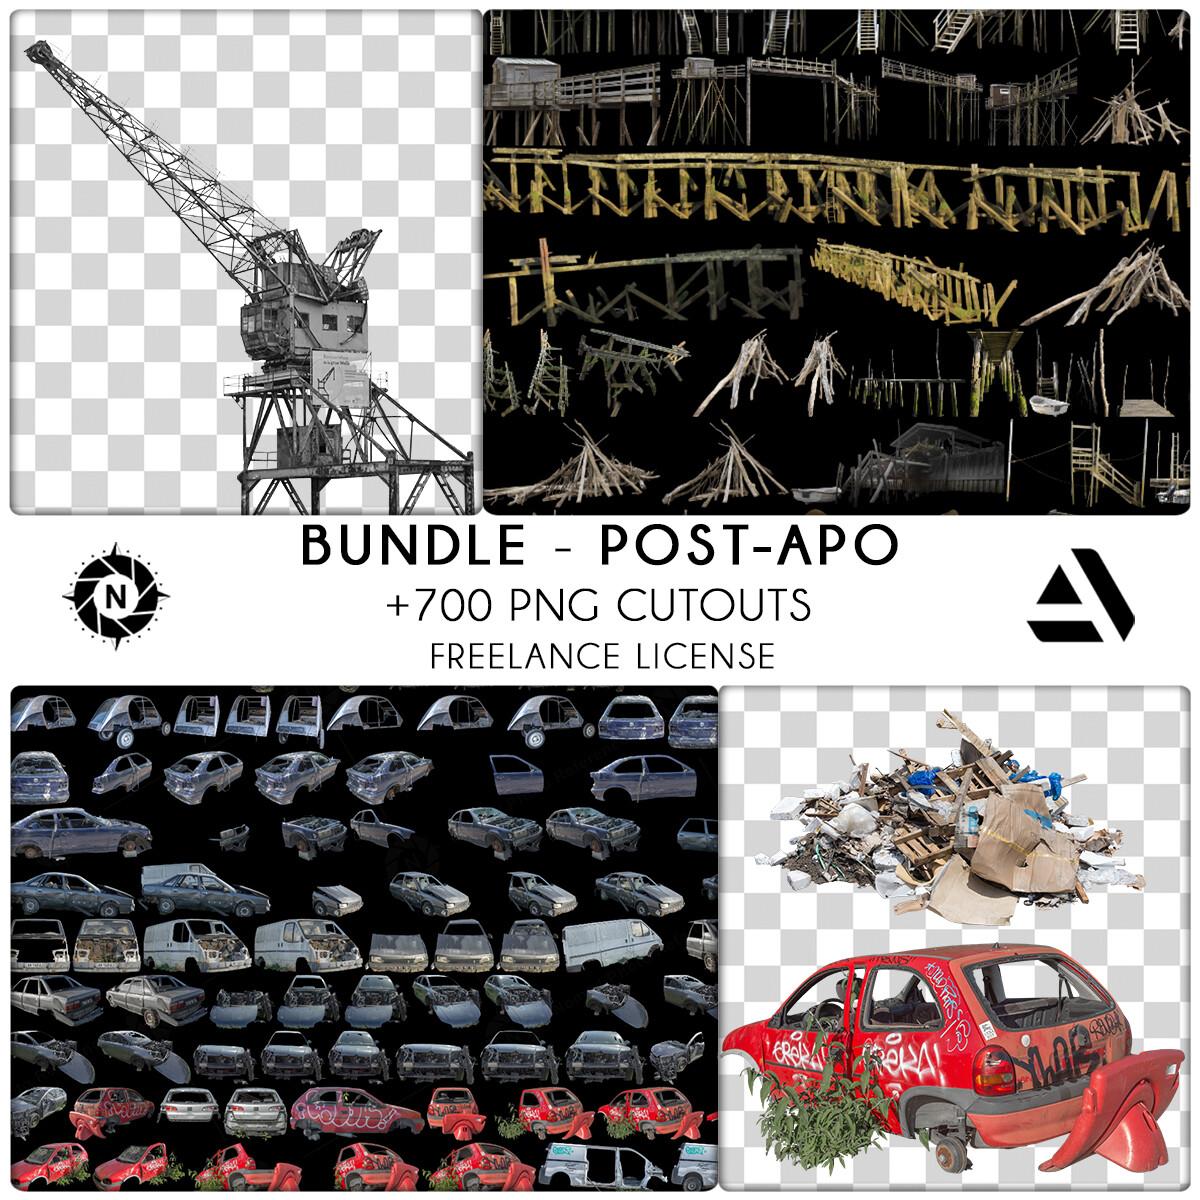 Bundle PNG Photo Packs: Post-Apocalyptic - Freelance License  https://www.artstation.com/a/6276937